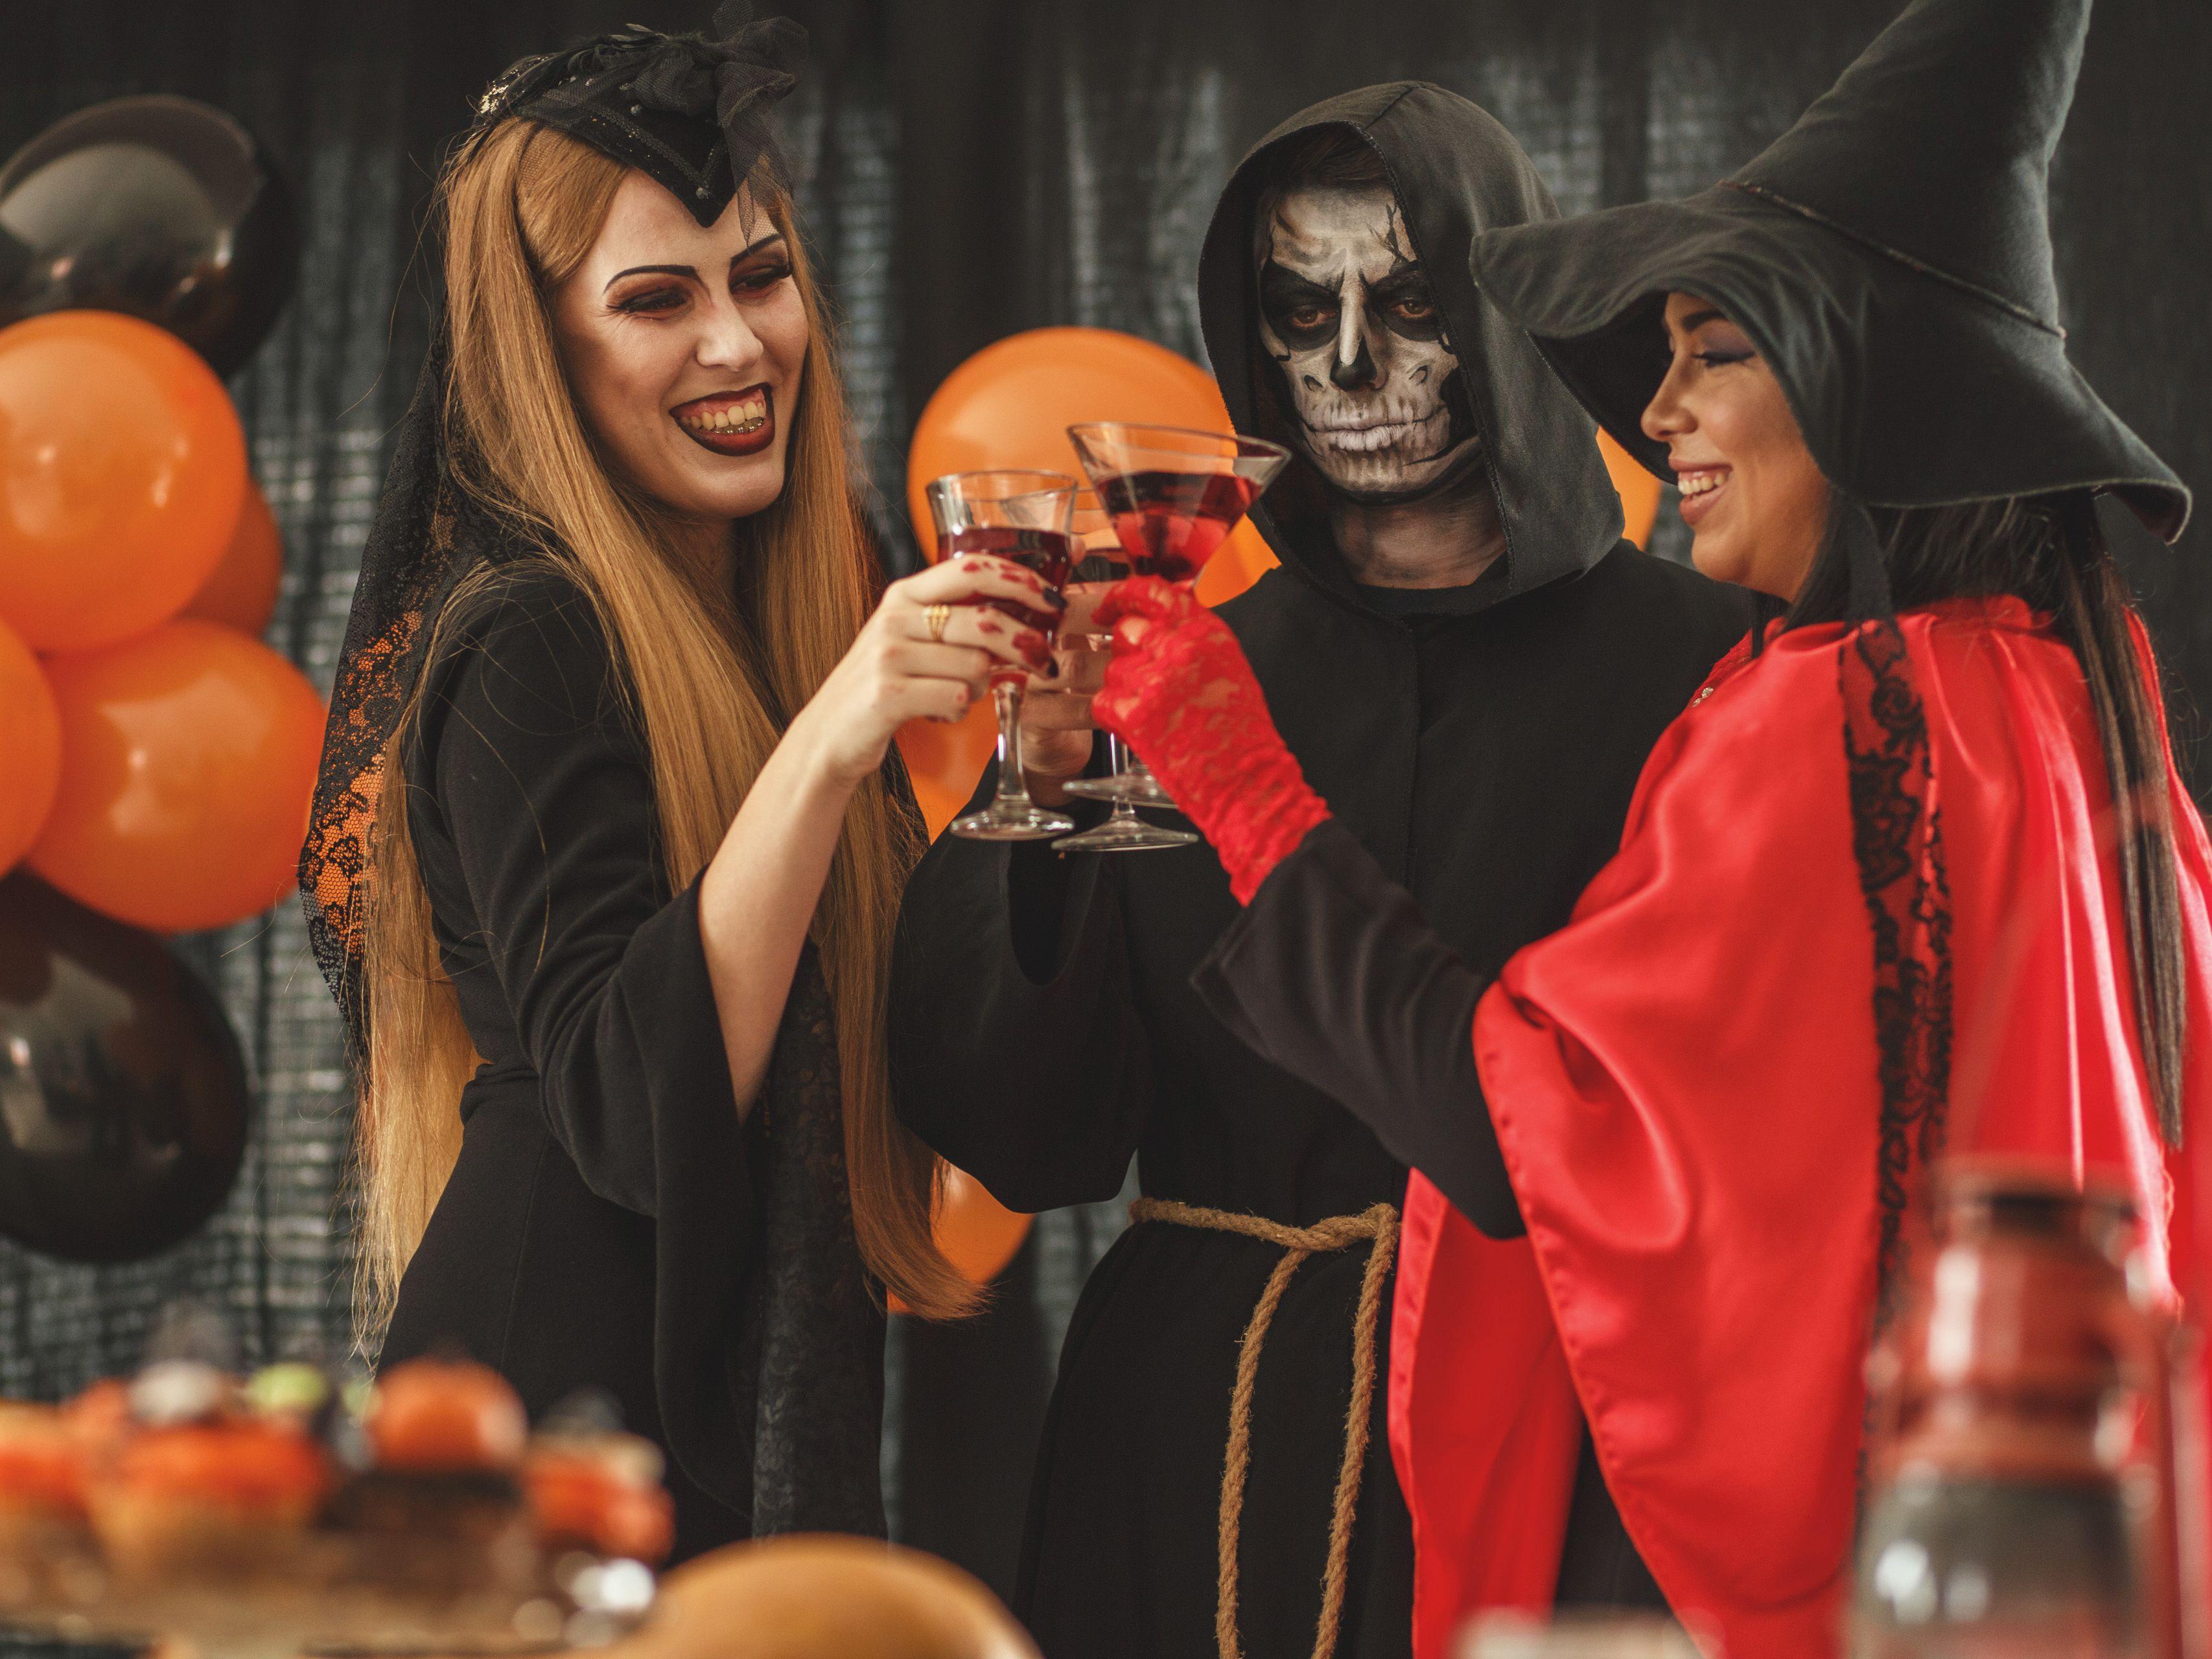 Printable Halloween Invitation Edit Any Age Print Within Minutes! Halloween Birthday Invitation Digital Download Kids Halloween Party